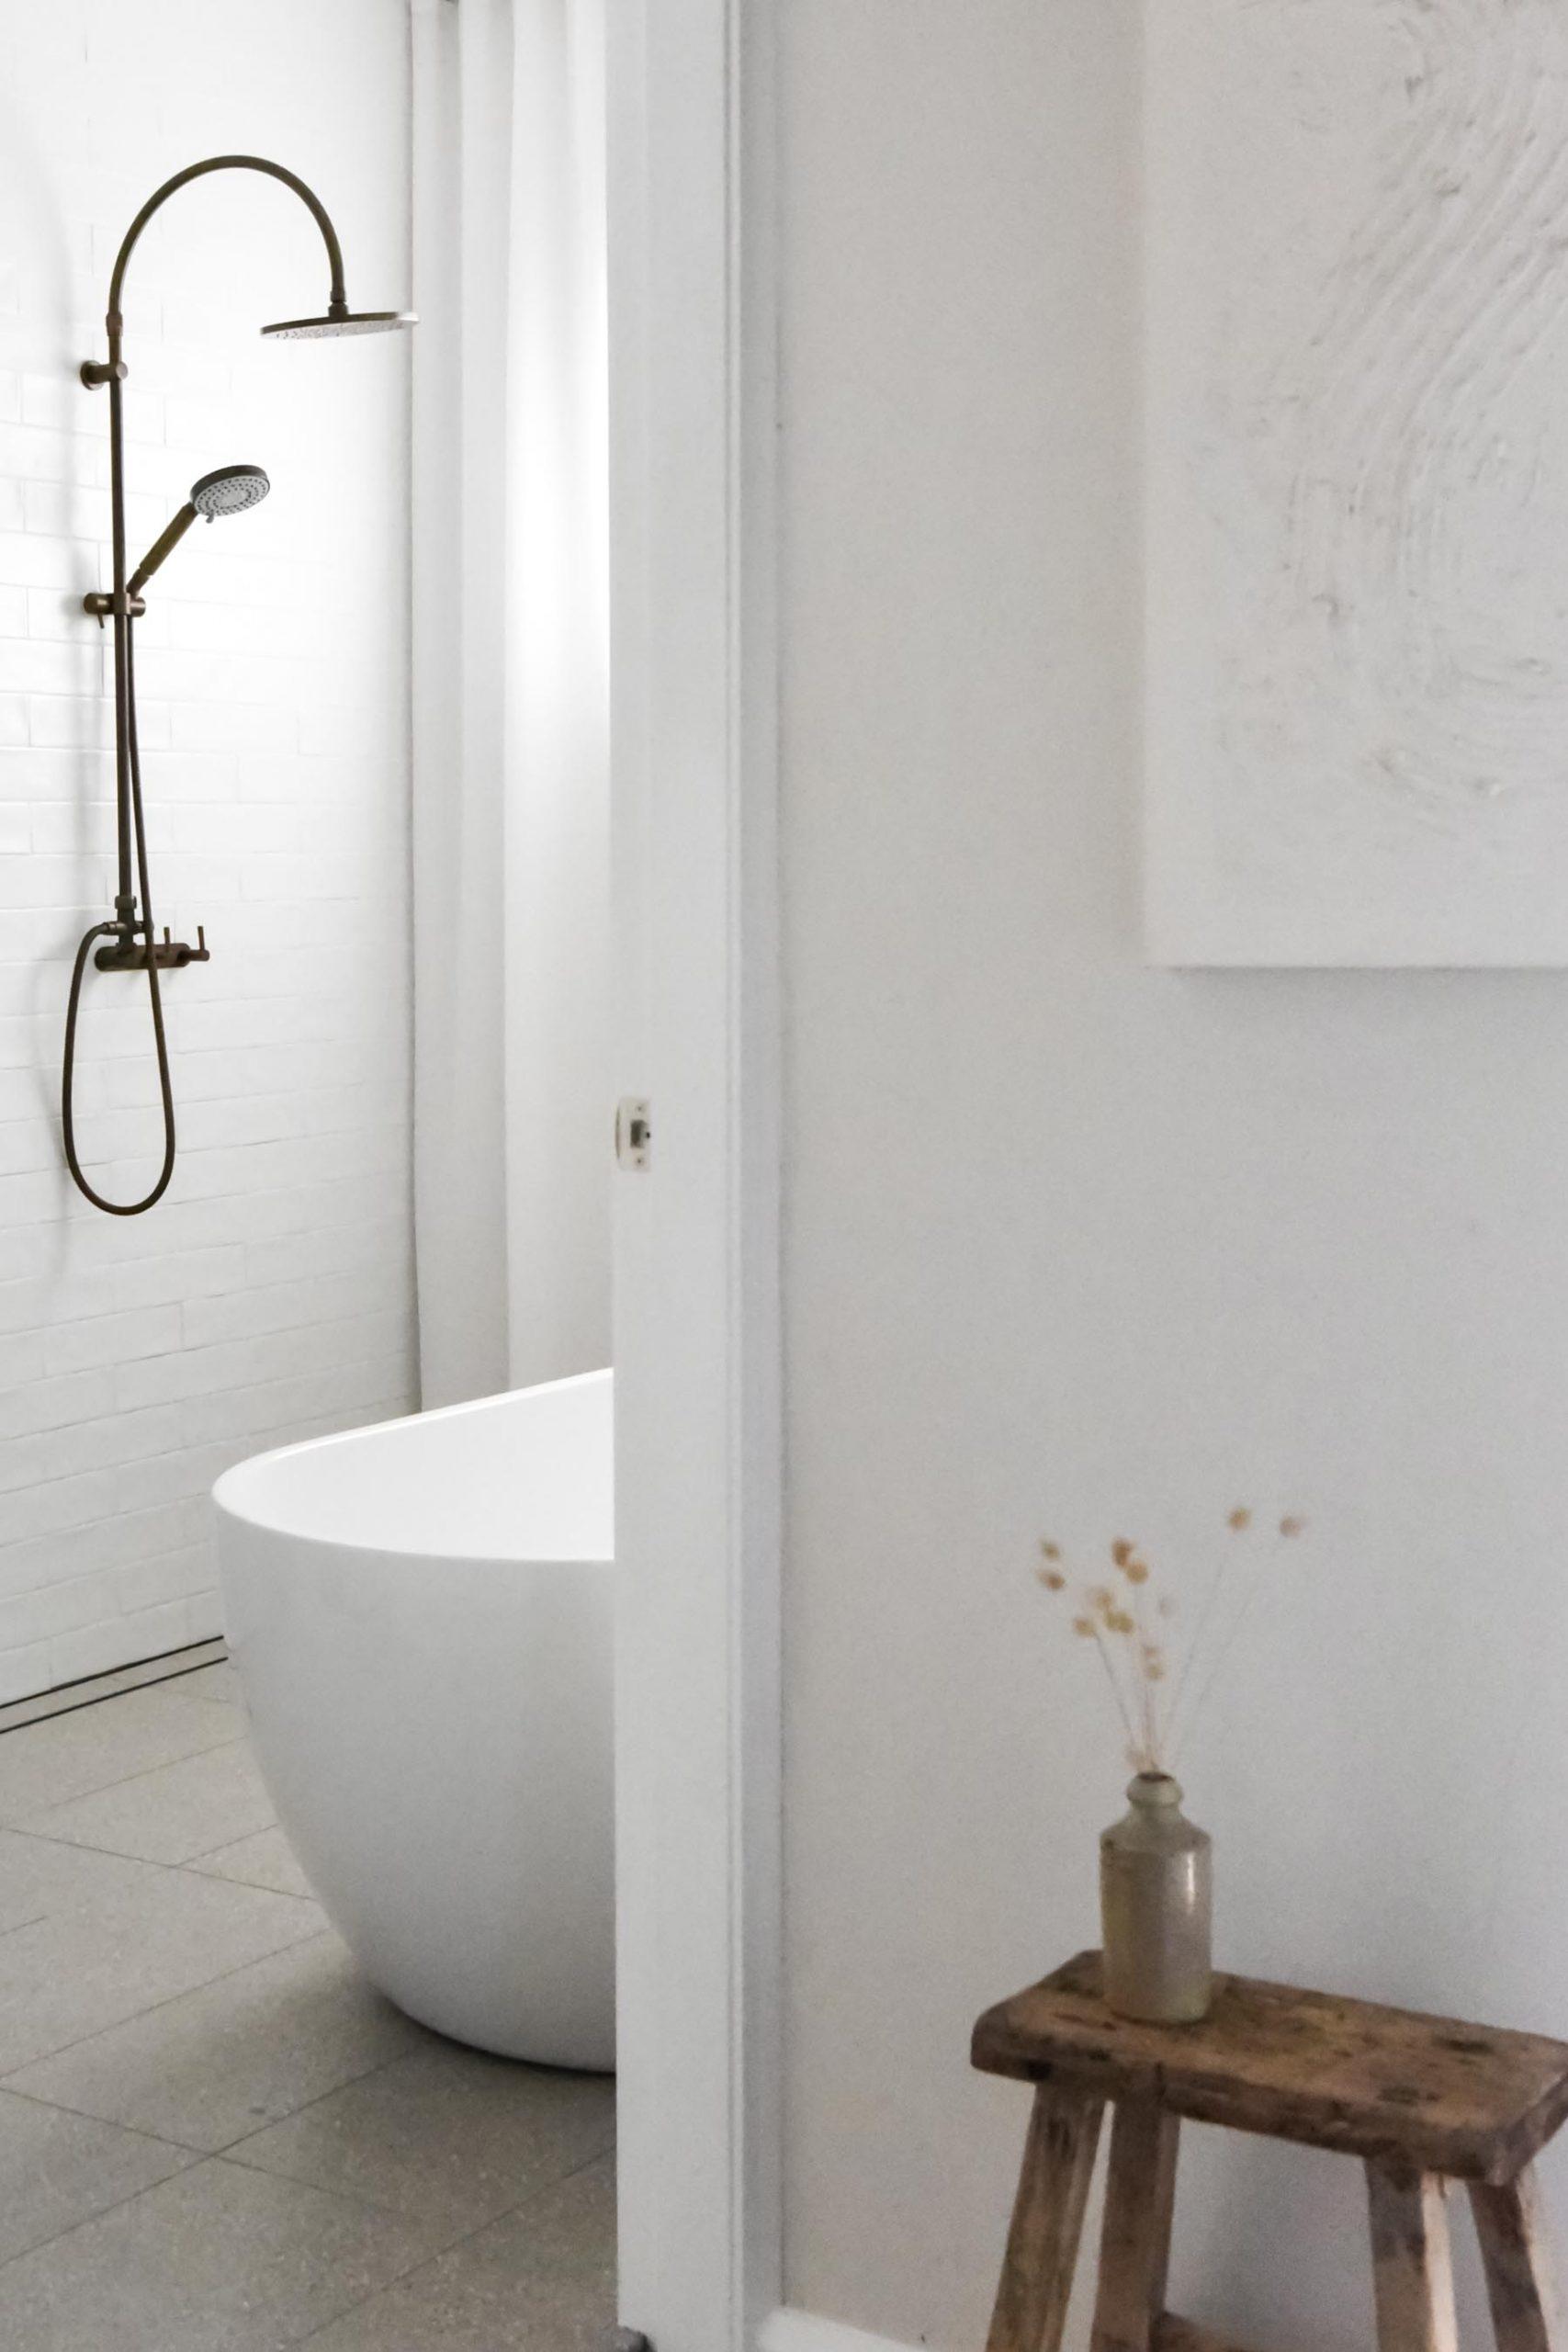 Minimalist bathroom curtains by GatherStudio